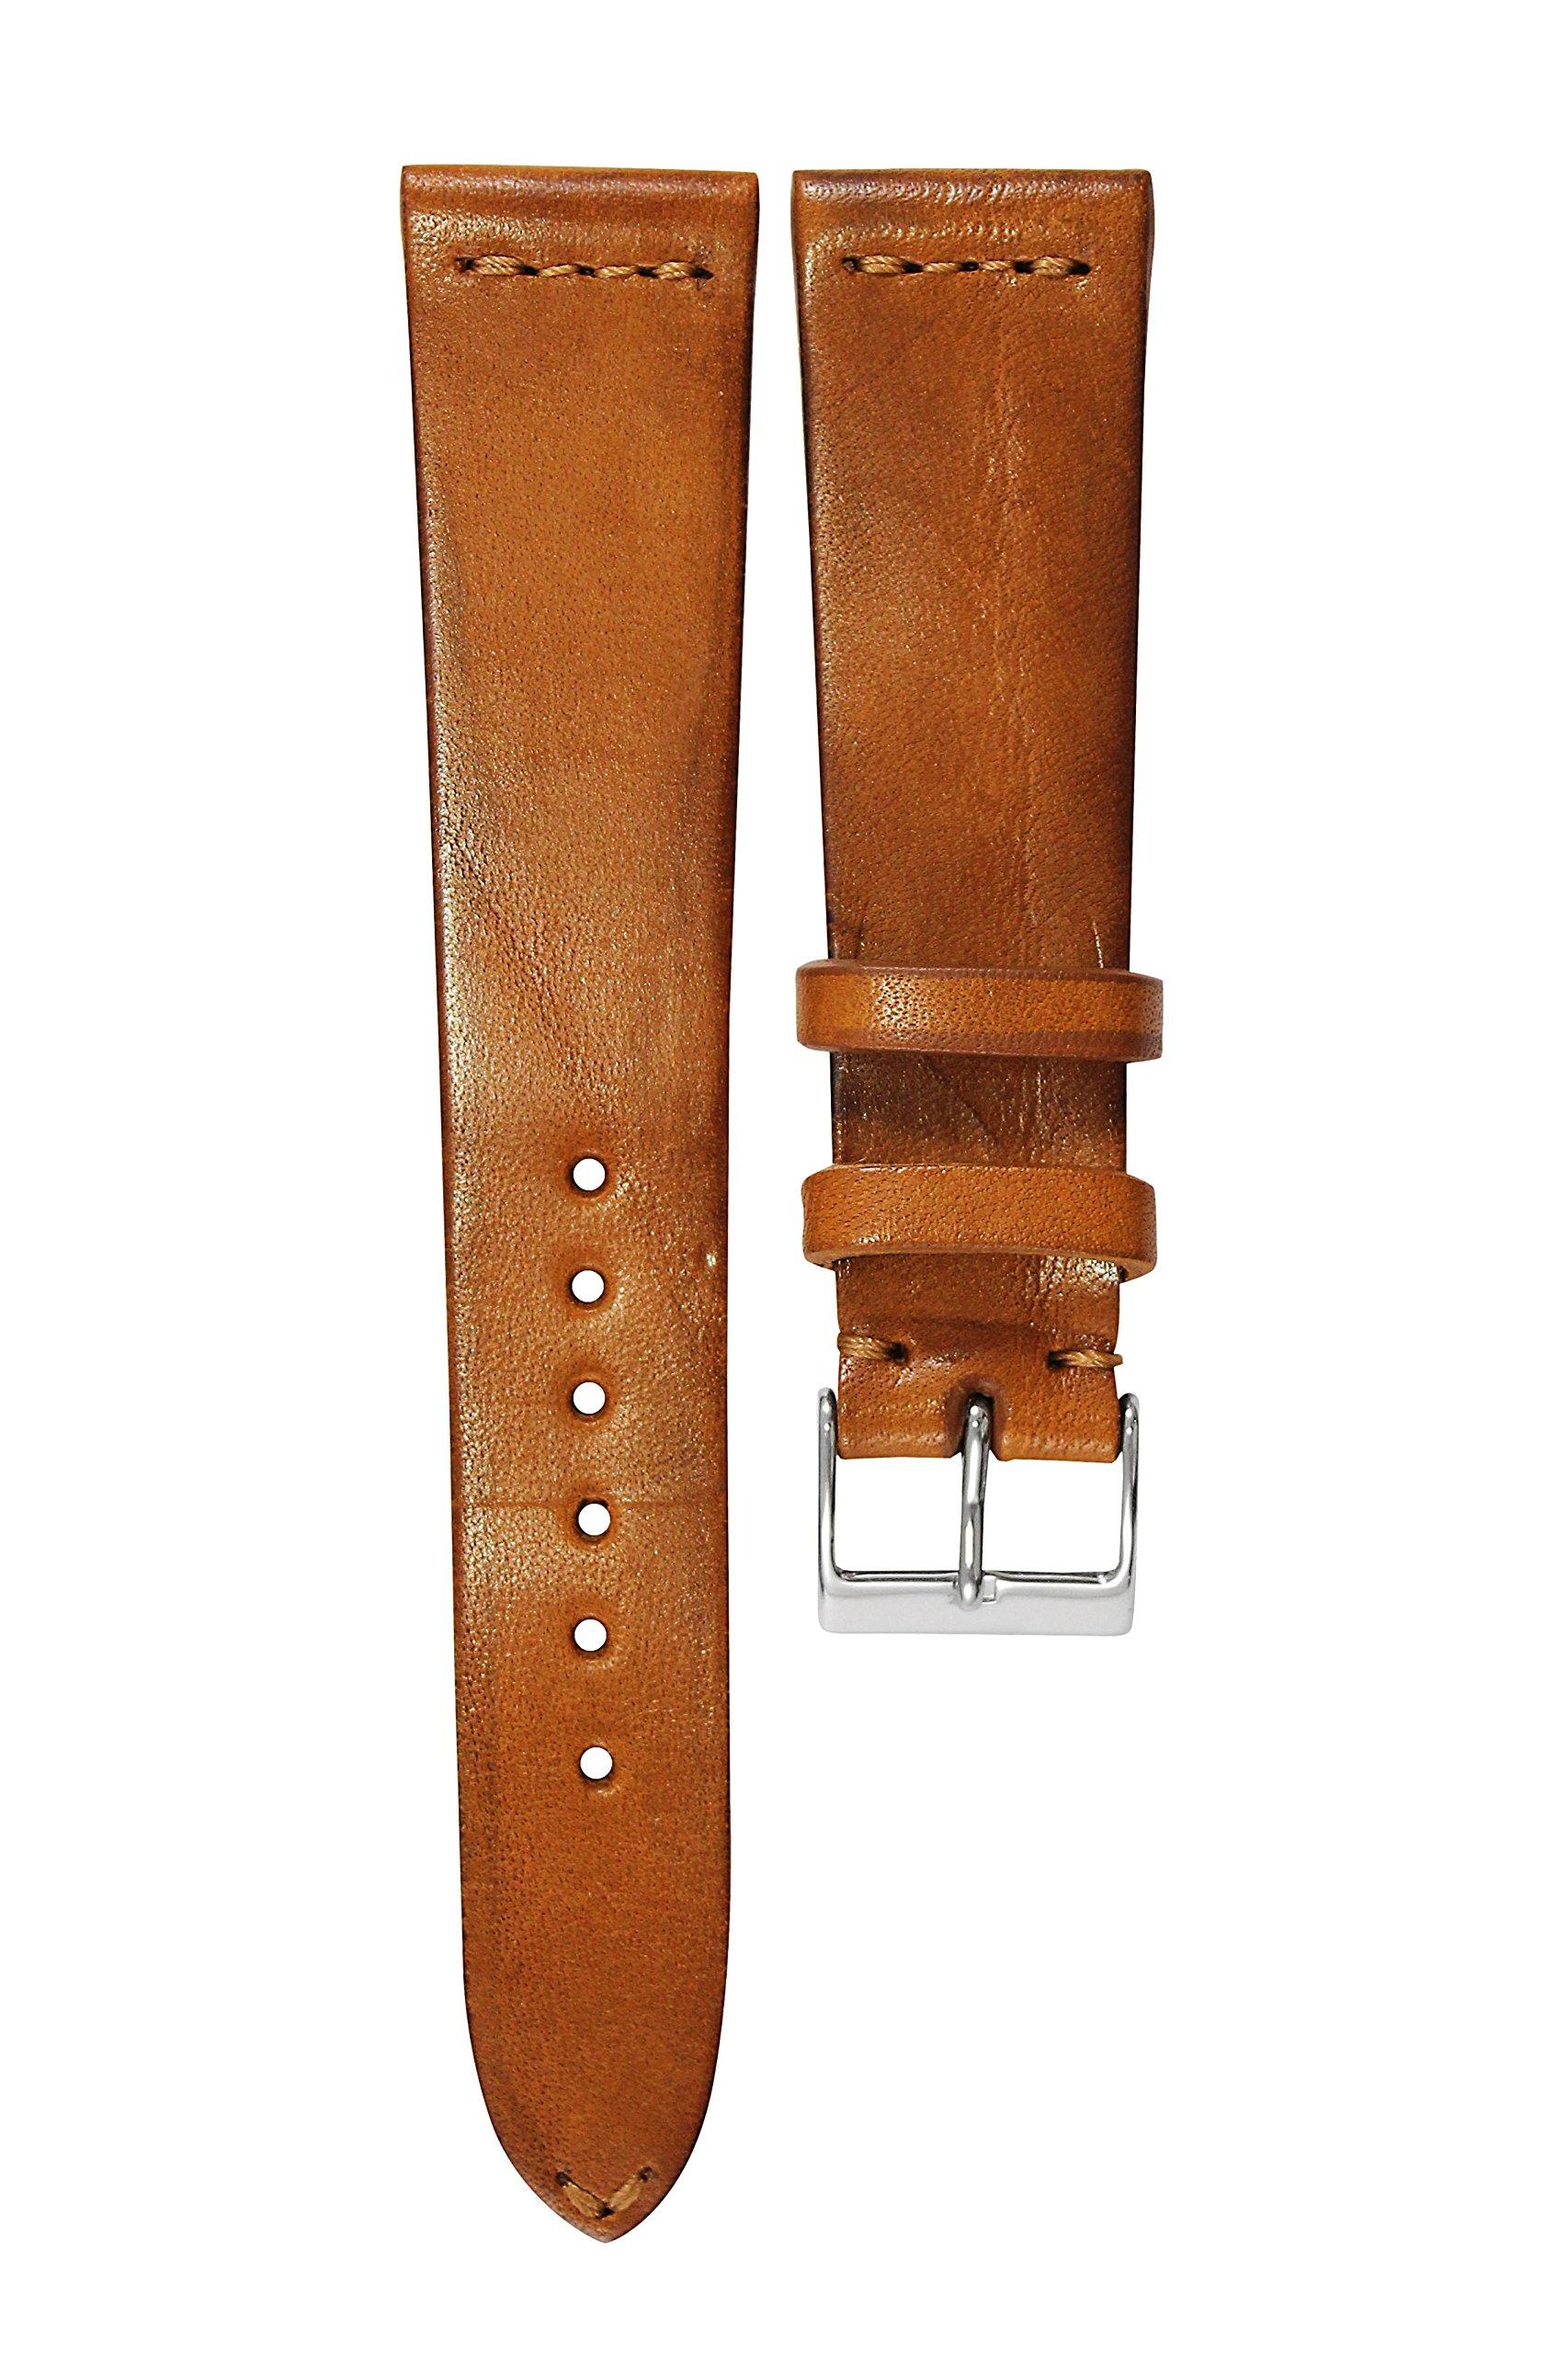 Rom-Uhrenarmband-HORWOOD-Handgefertig-Italien-20mm-Bandbreite-Leder-Braun